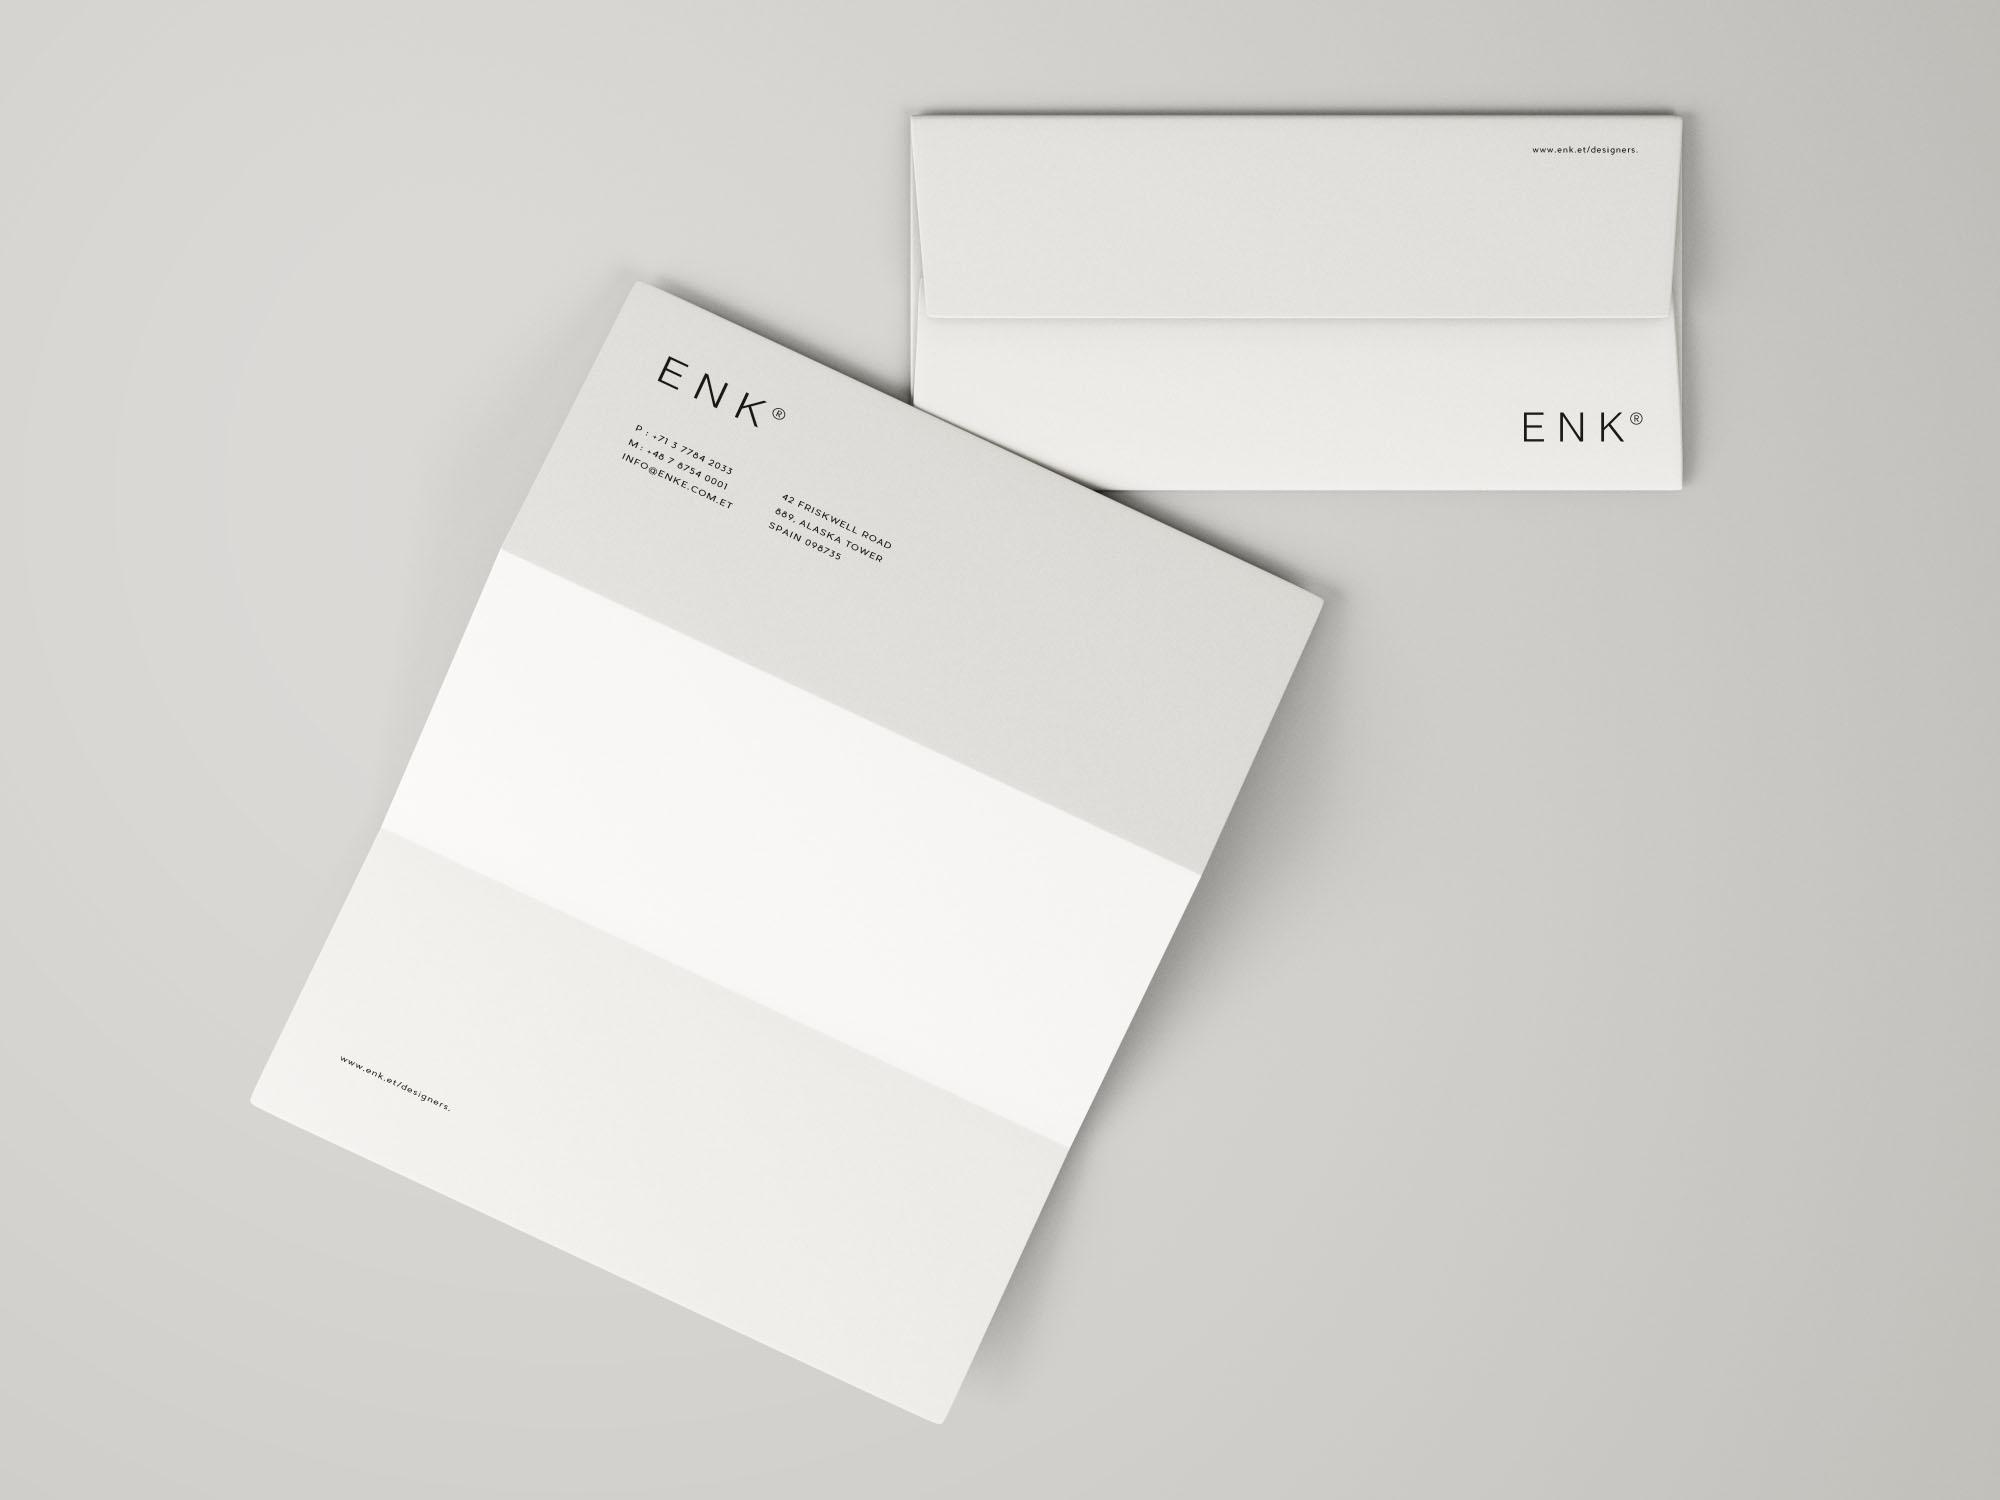 Free Envelope and A4 Folded Letterhead Mockup